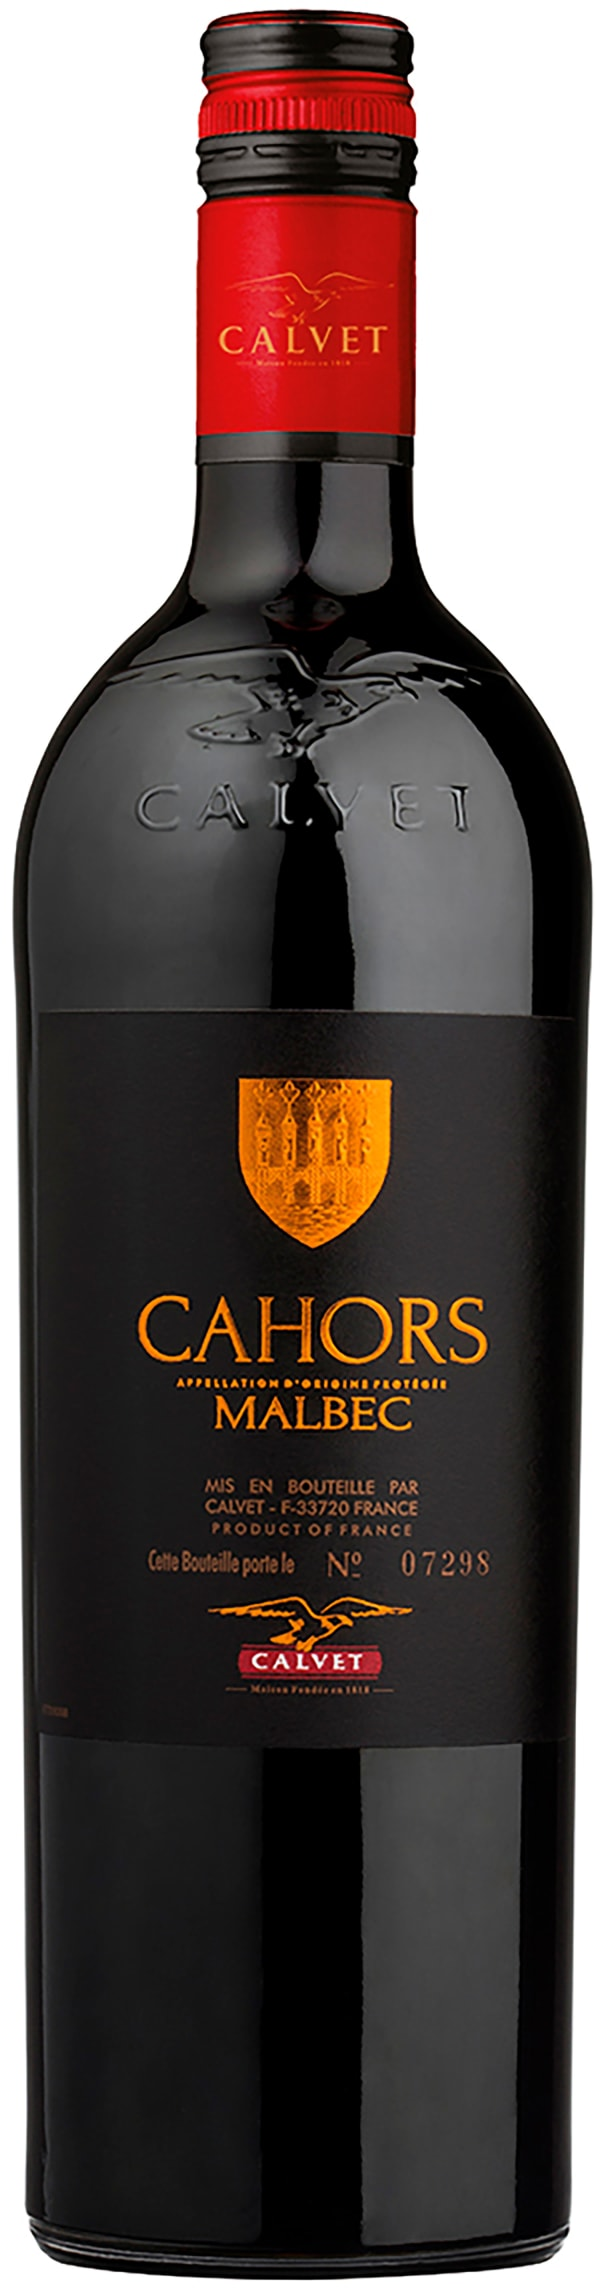 Calvet Cahors Malbec 2016